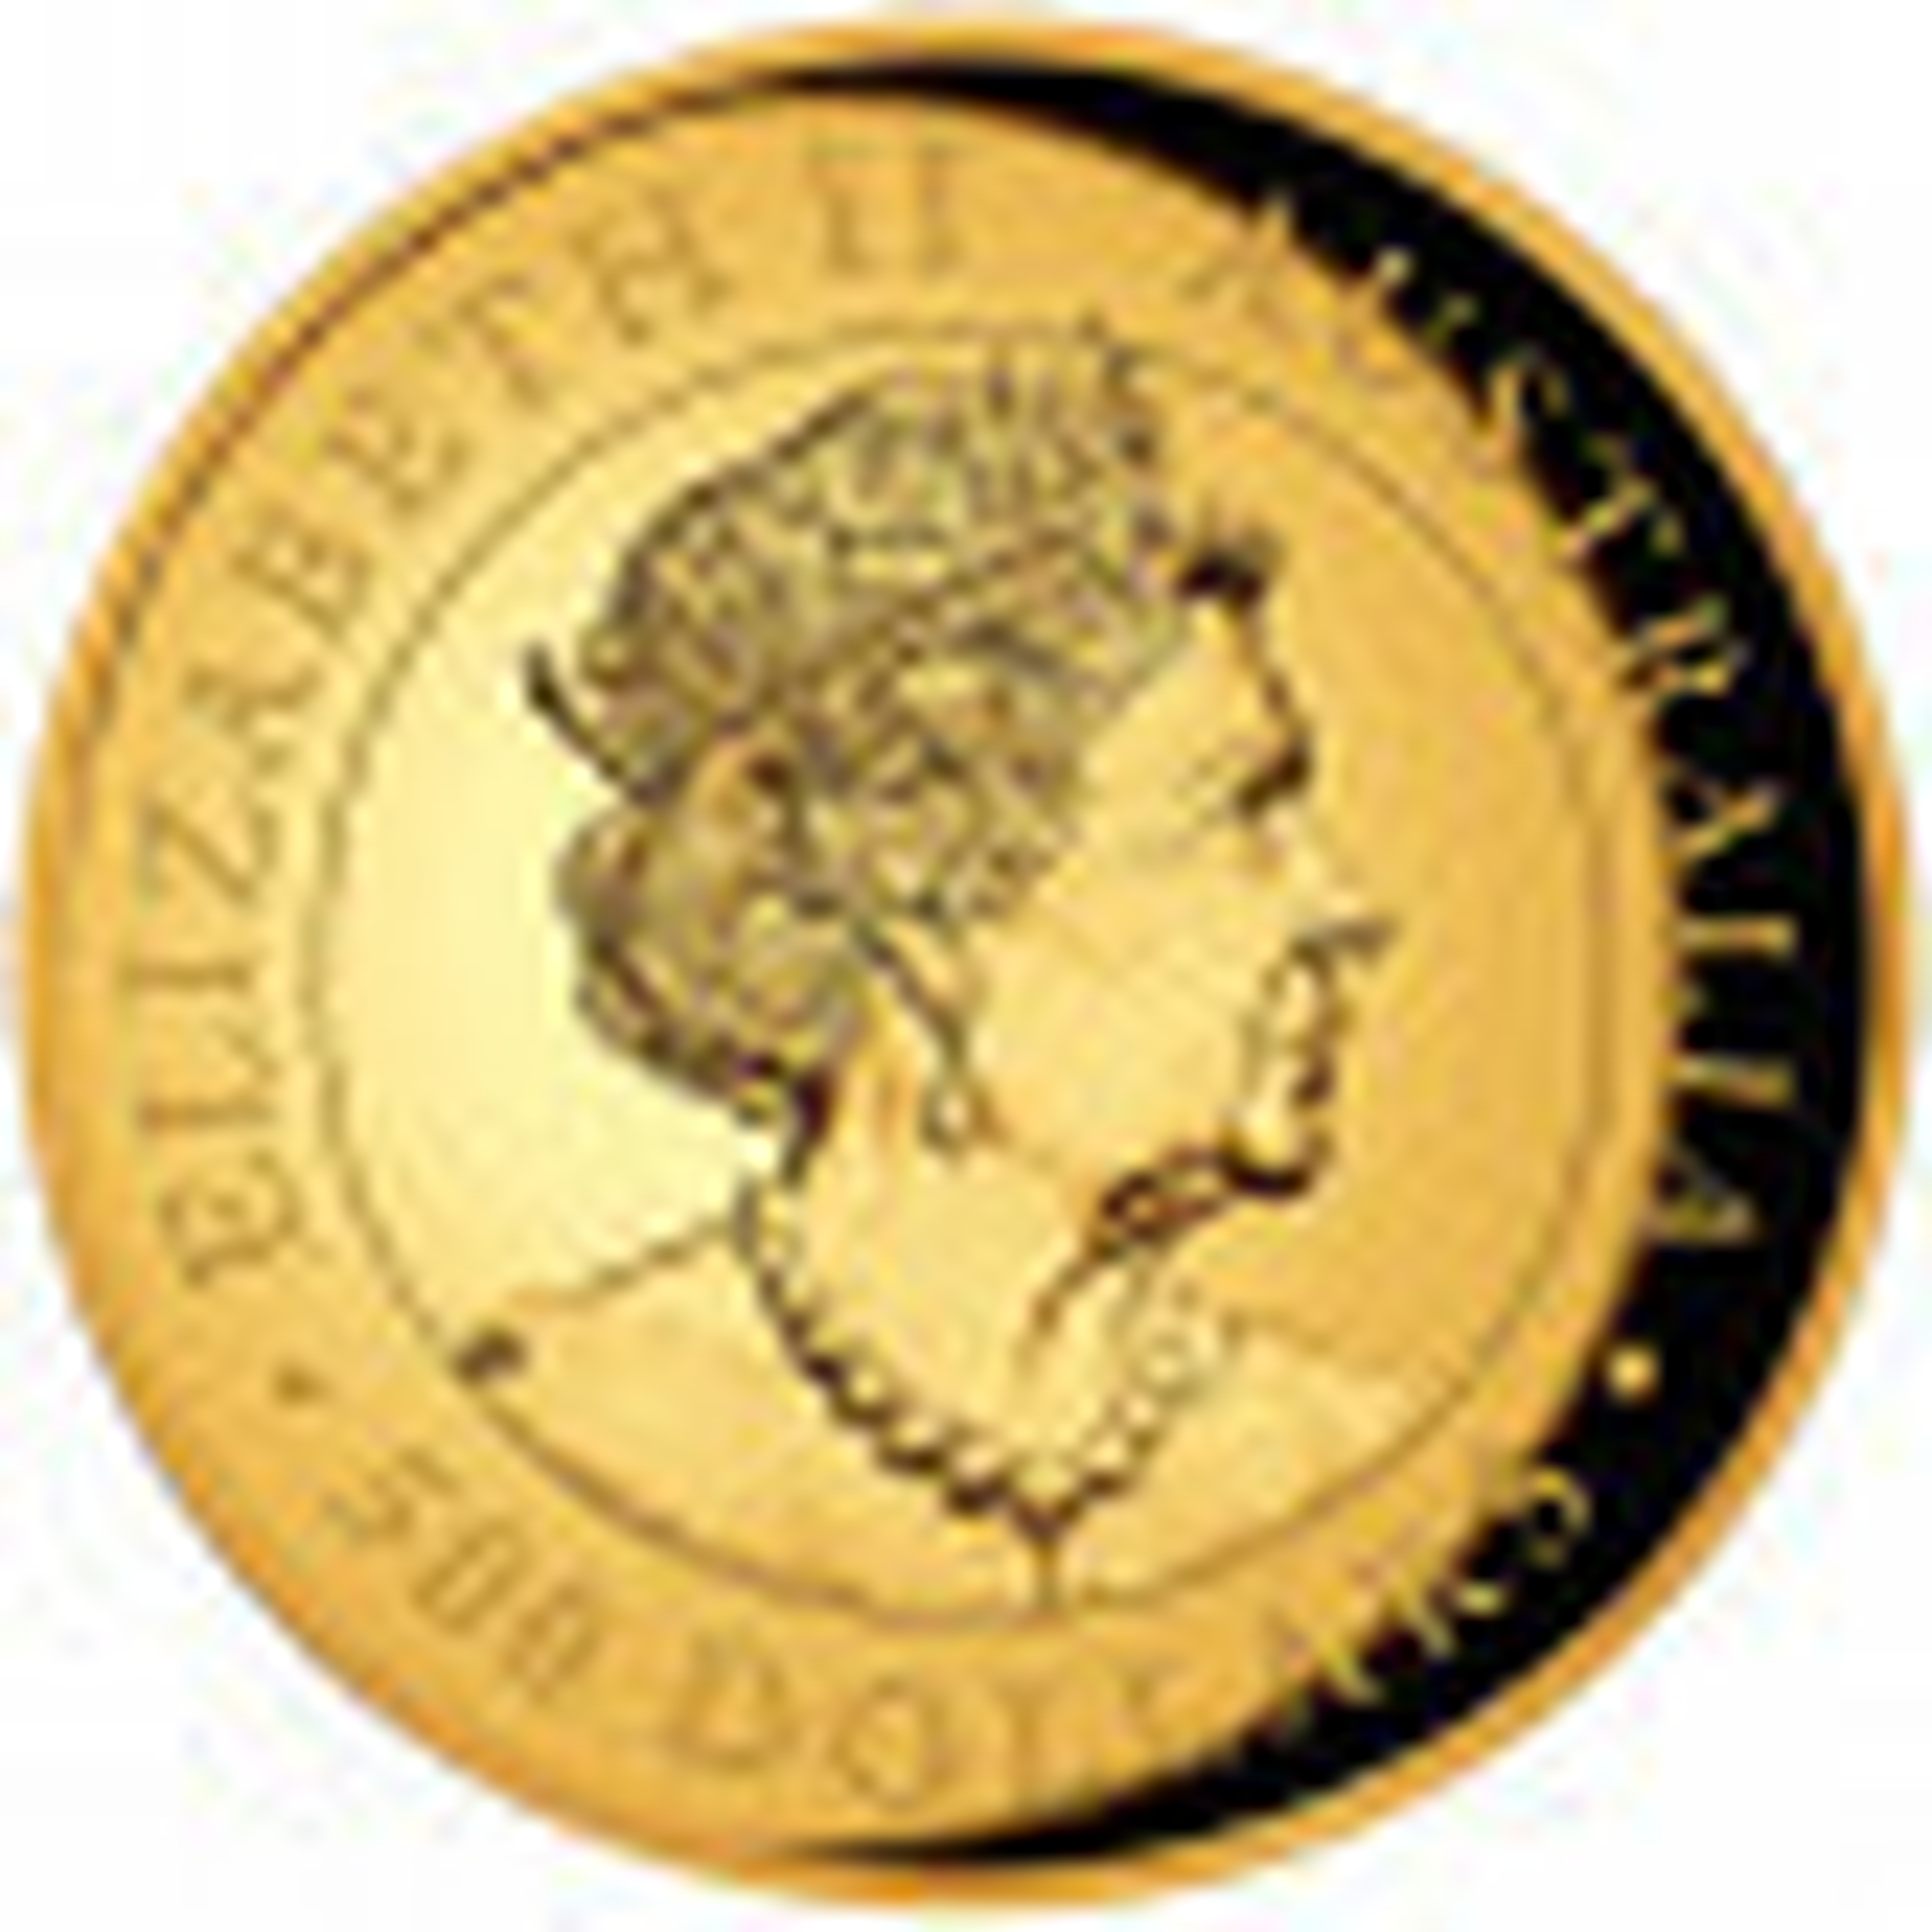 Kookaburra 5 troy ounce gouden munt 2021 Proof